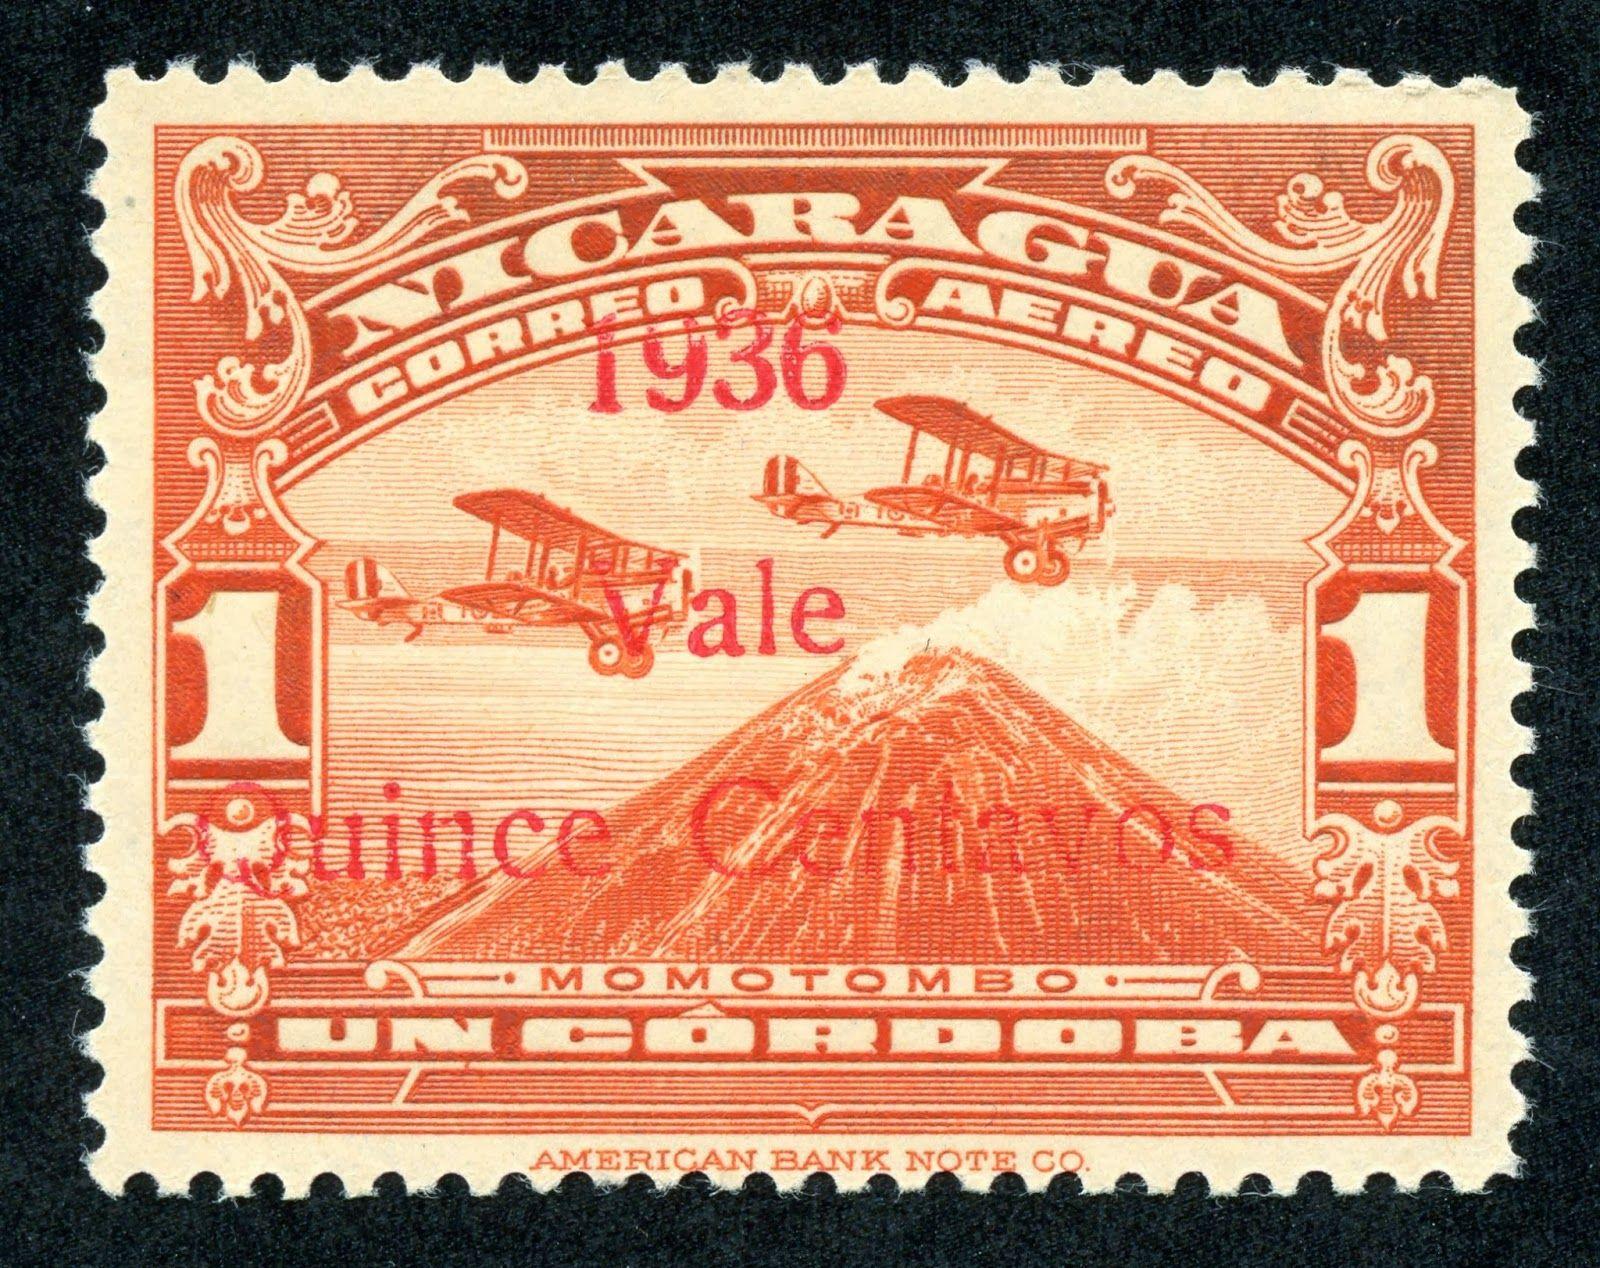 1937 Scott C206 25c violet brown